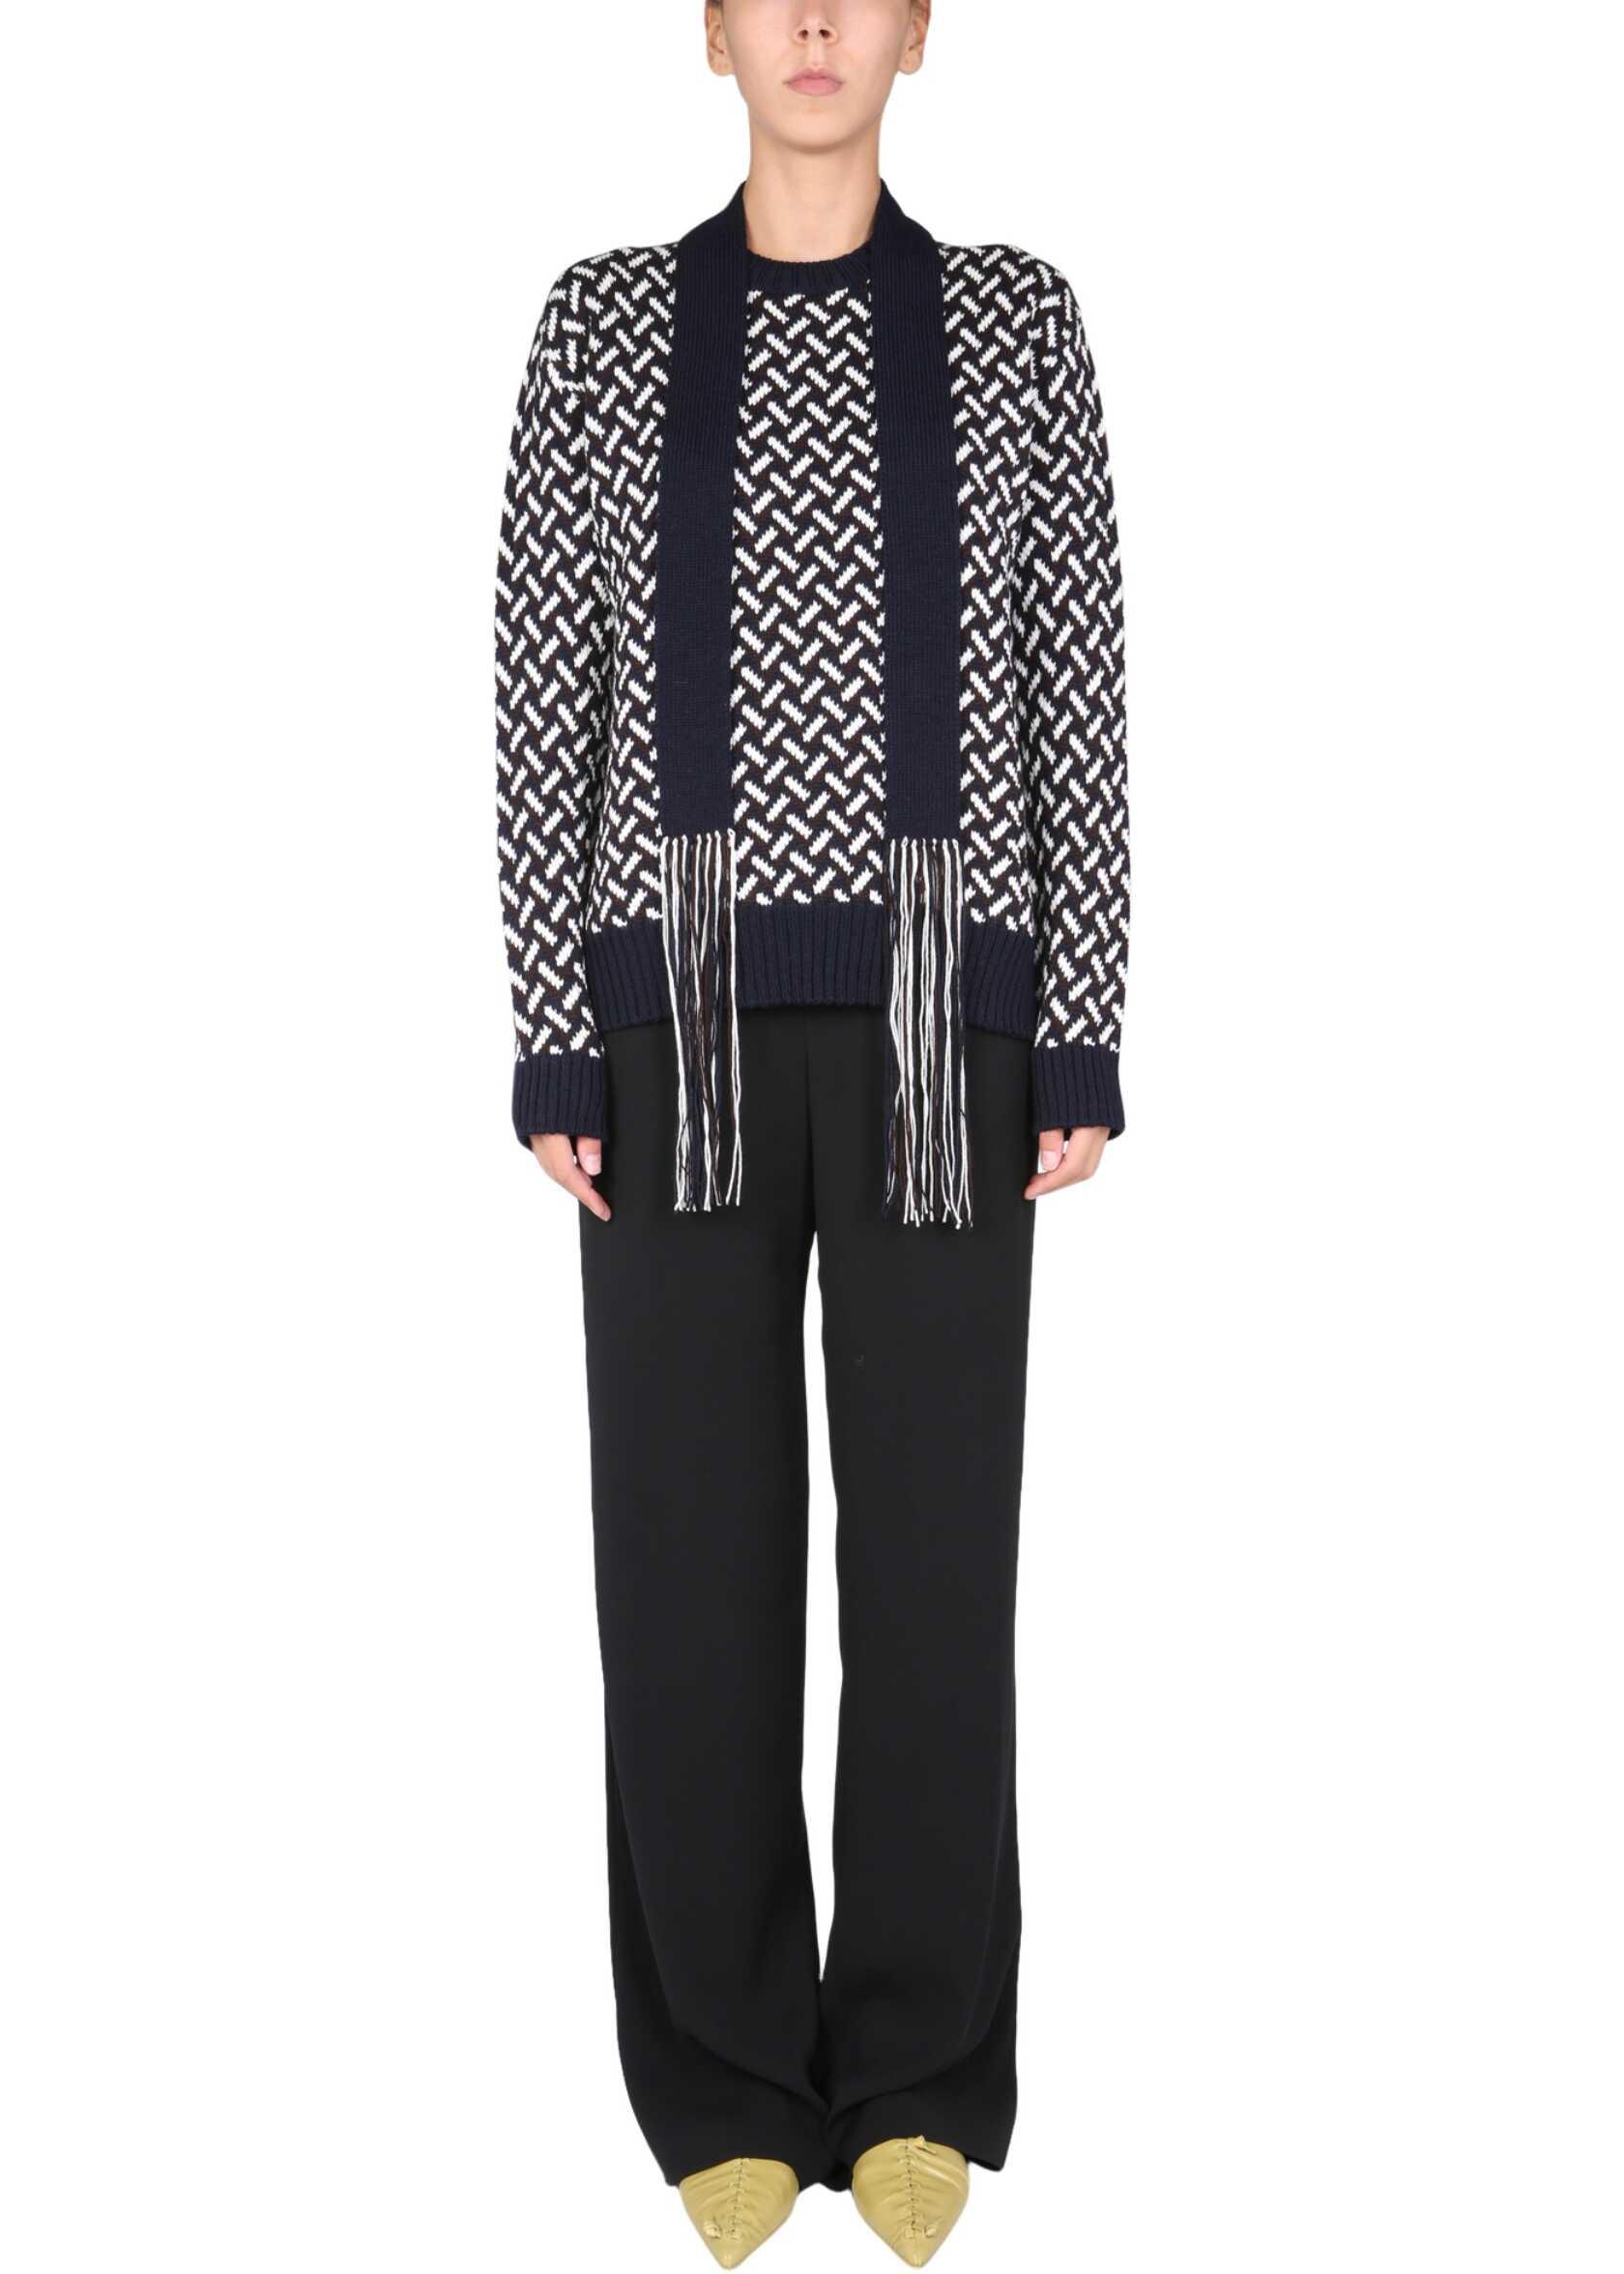 Jil Sander Jacquard Sweater JSWT752301_WTY20088970 MULTICOLOUR image0